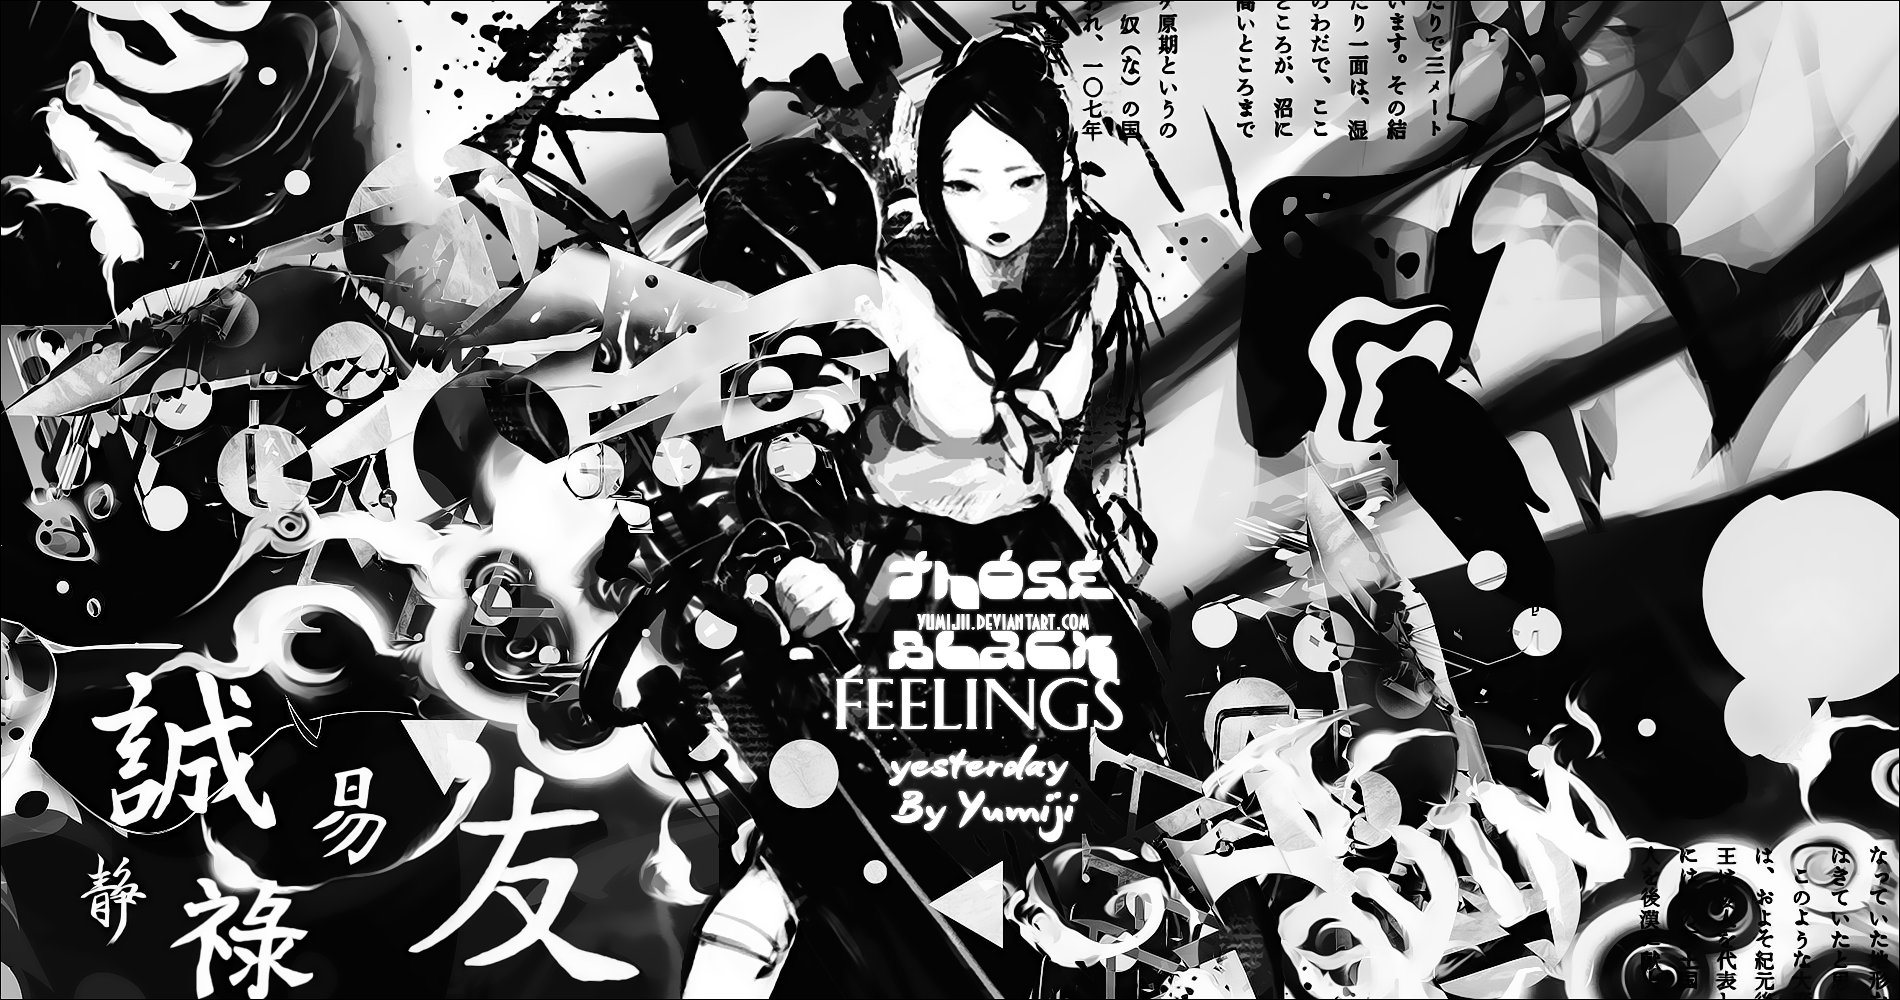 Galerie de Yumiji =) Wallpaper_those_black_feelings_by_yumijii-d72w70c